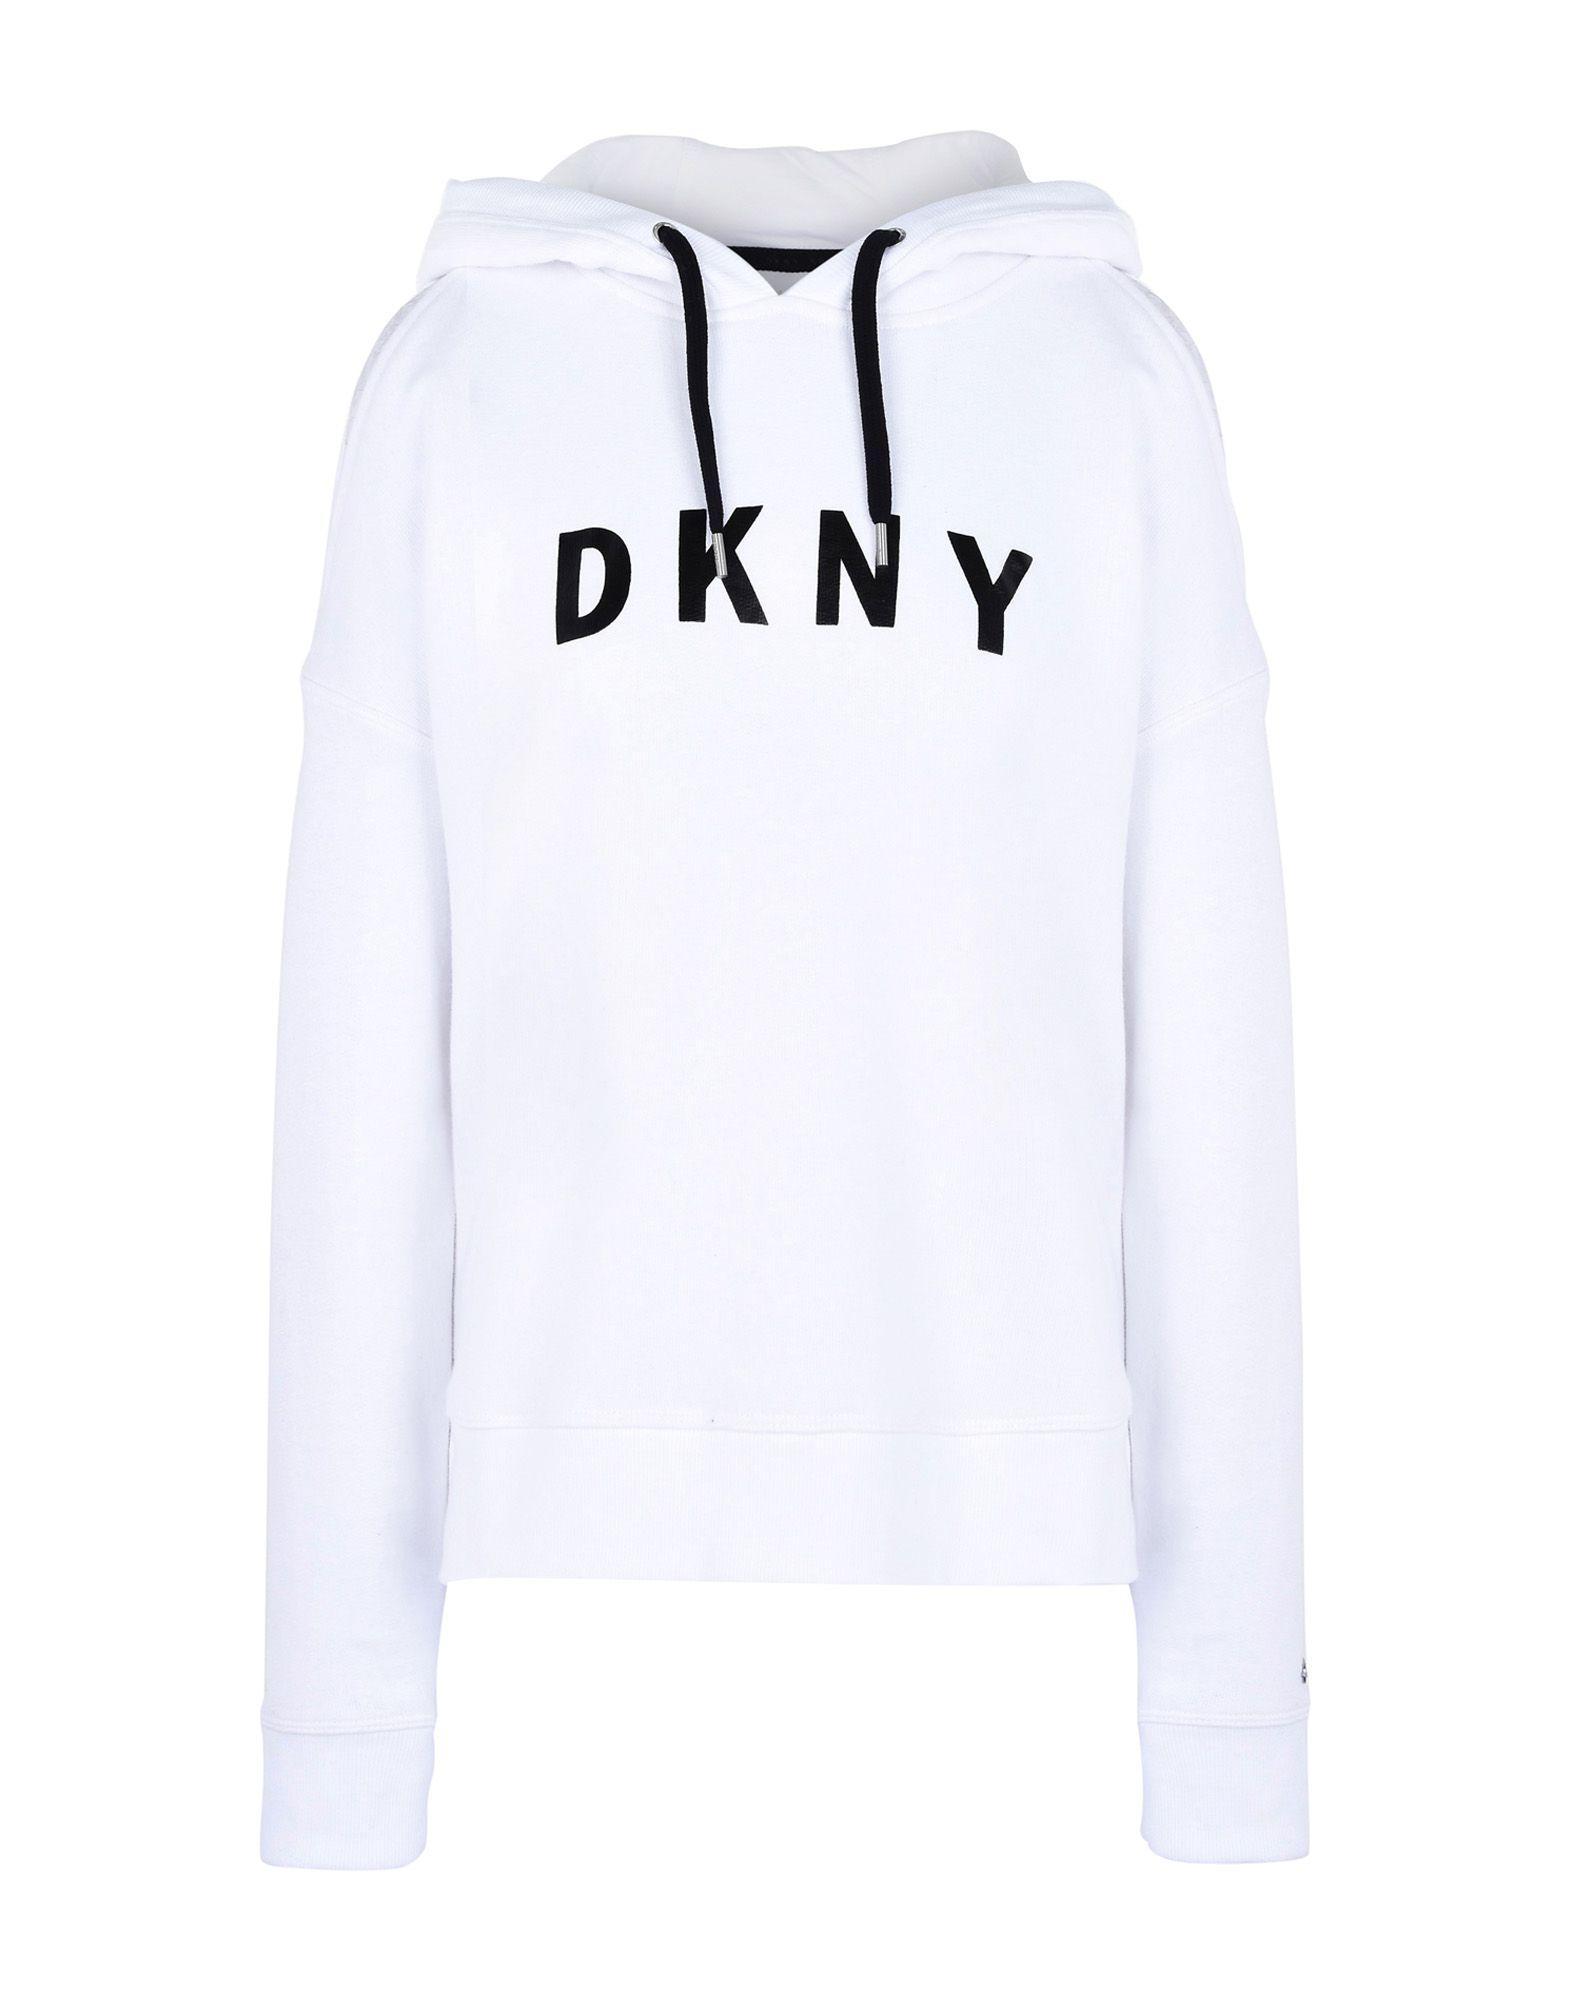 Фото - DKNY Толстовка обувь на высокой платформе dkny